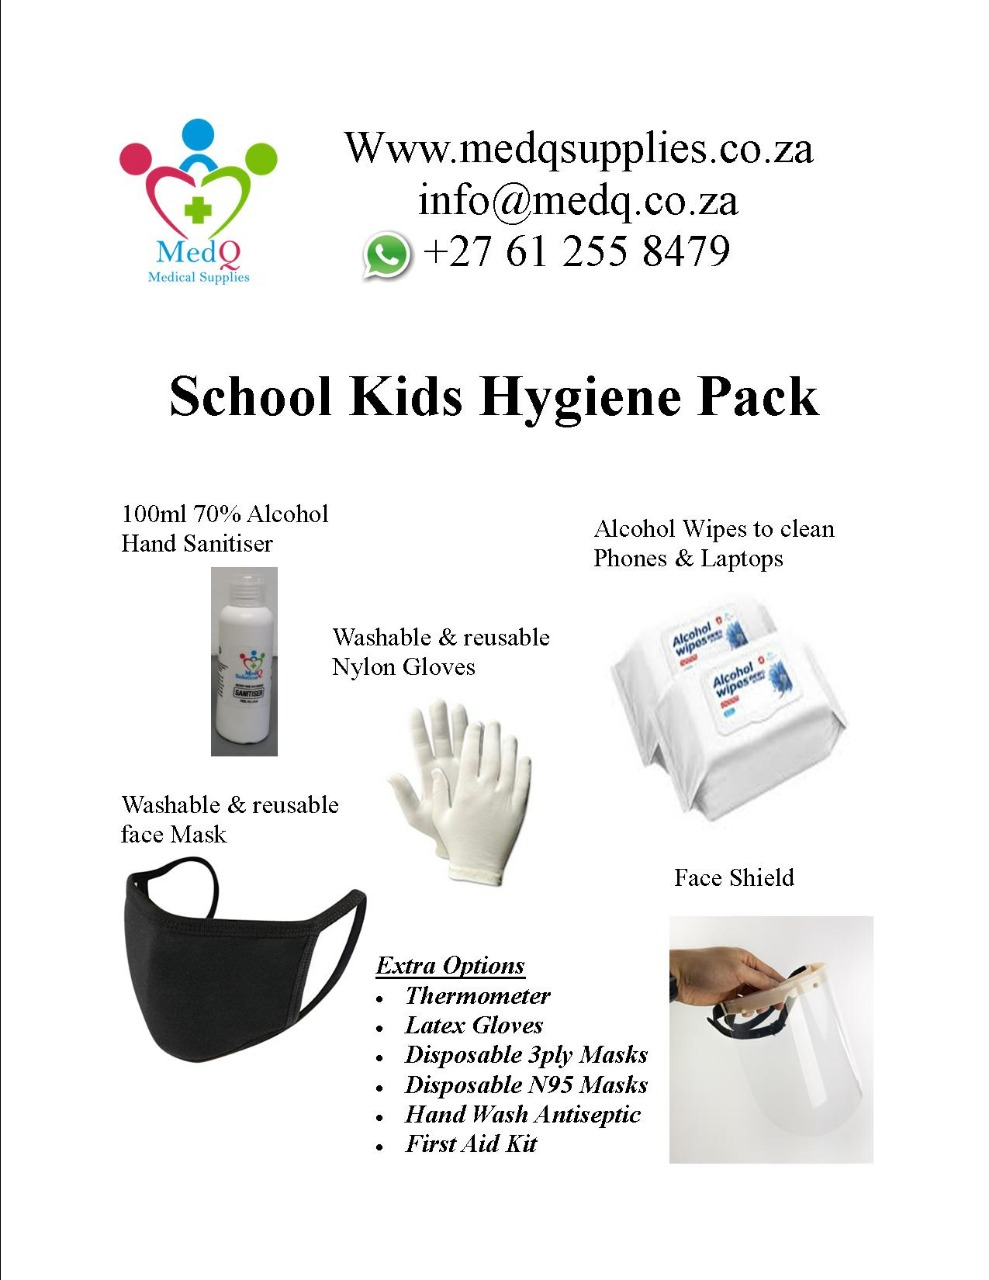 School kids Hygiene pack